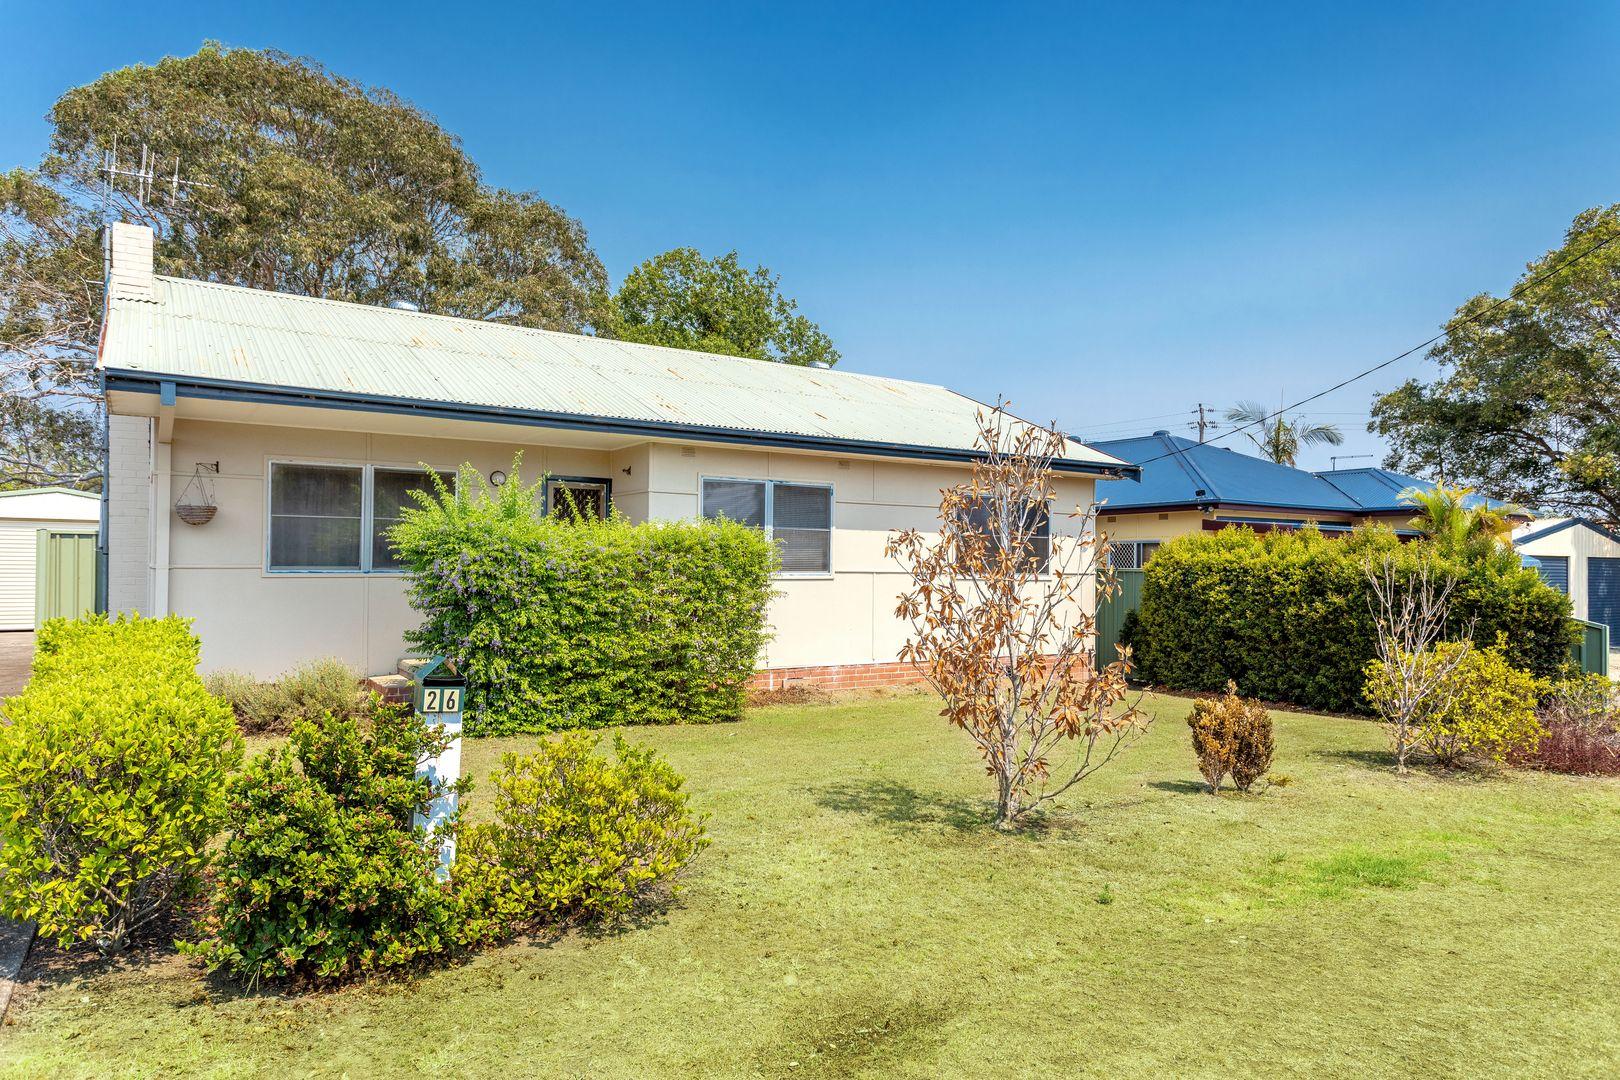 26 Wingham Road, Taree NSW 2430, Image 0